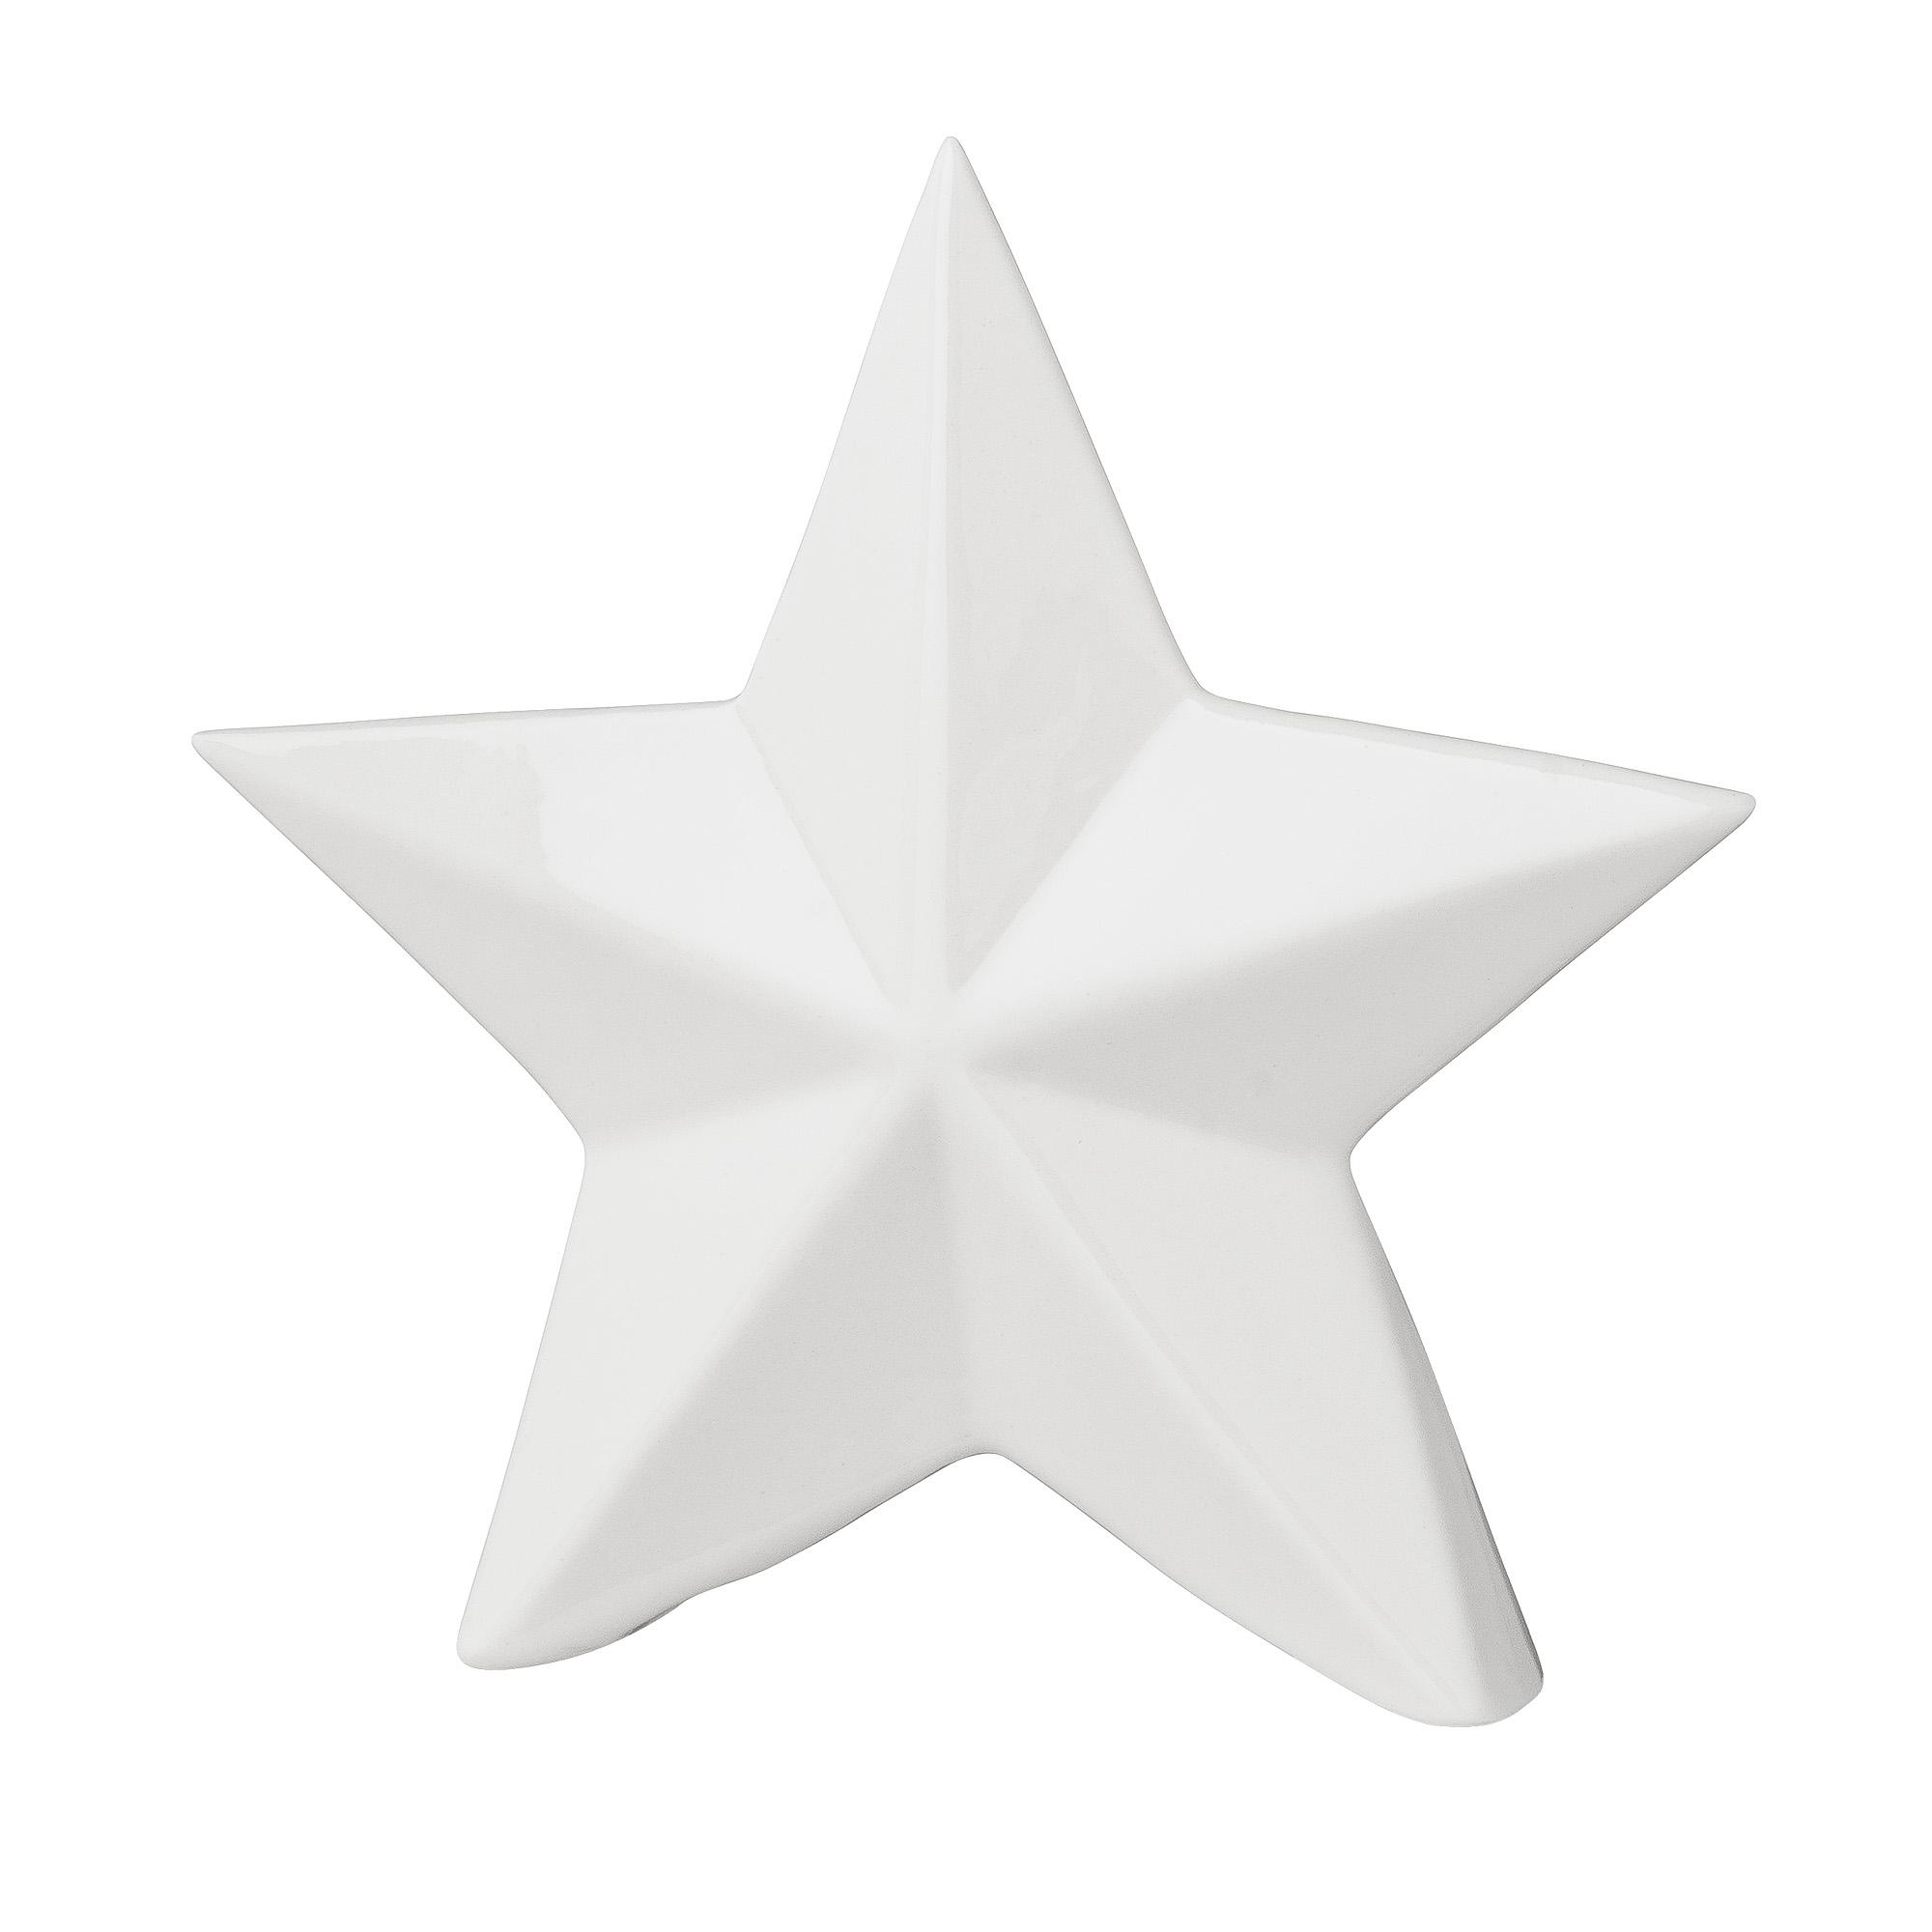 Decoratiune Alistar Alba, Portelan, l14,7xA3,5xH14 cm imagine